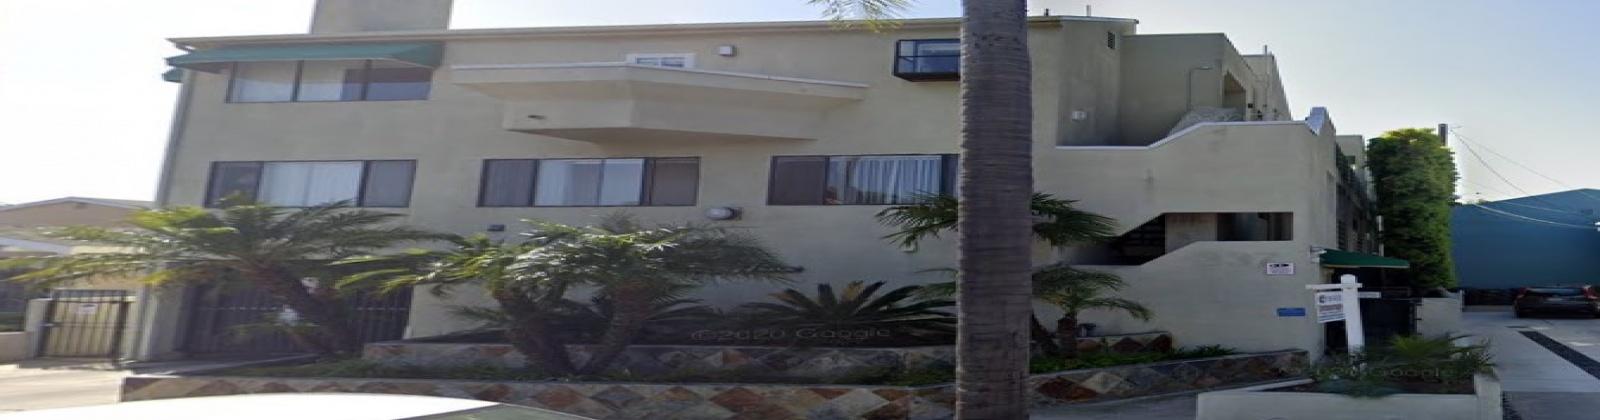 342 Redondo Ave, Long Beach, California 90814, 2 Bedrooms Bedrooms, ,1 BathroomBathrooms,Apartment,For Rent,Redondo Ave,1011